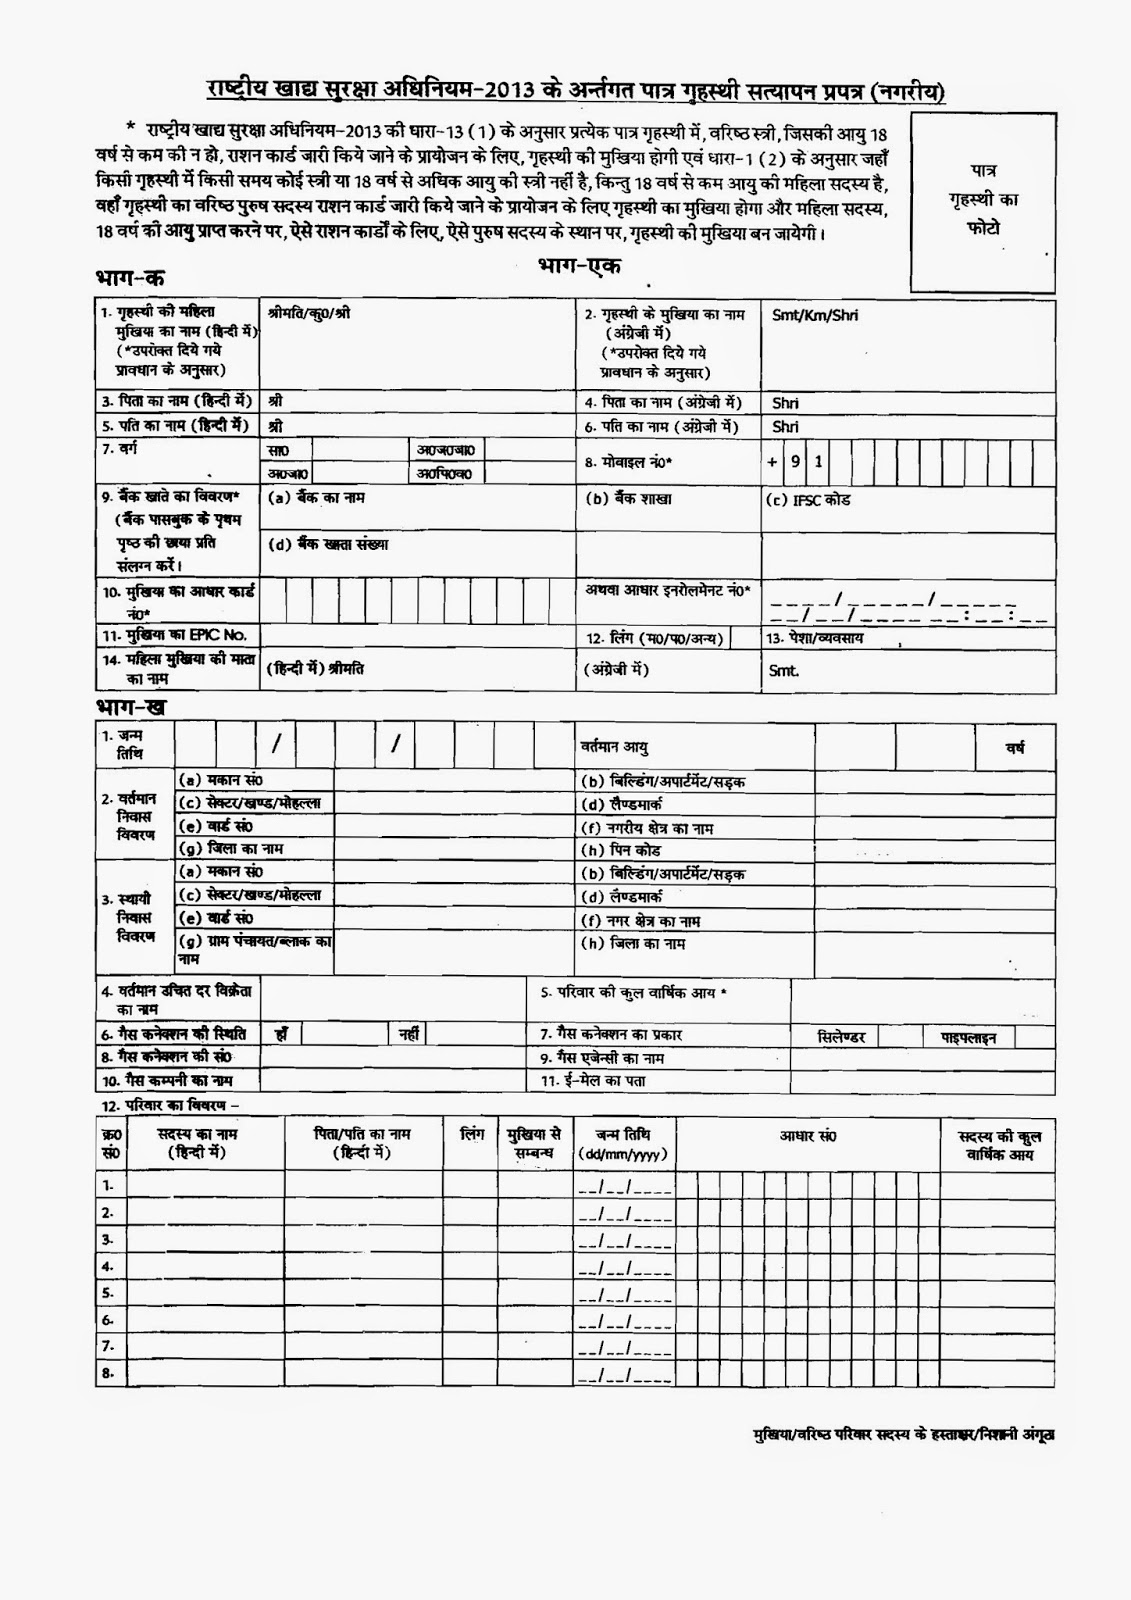 Ration Card Form attachment PDF | Bhavneet Sharma